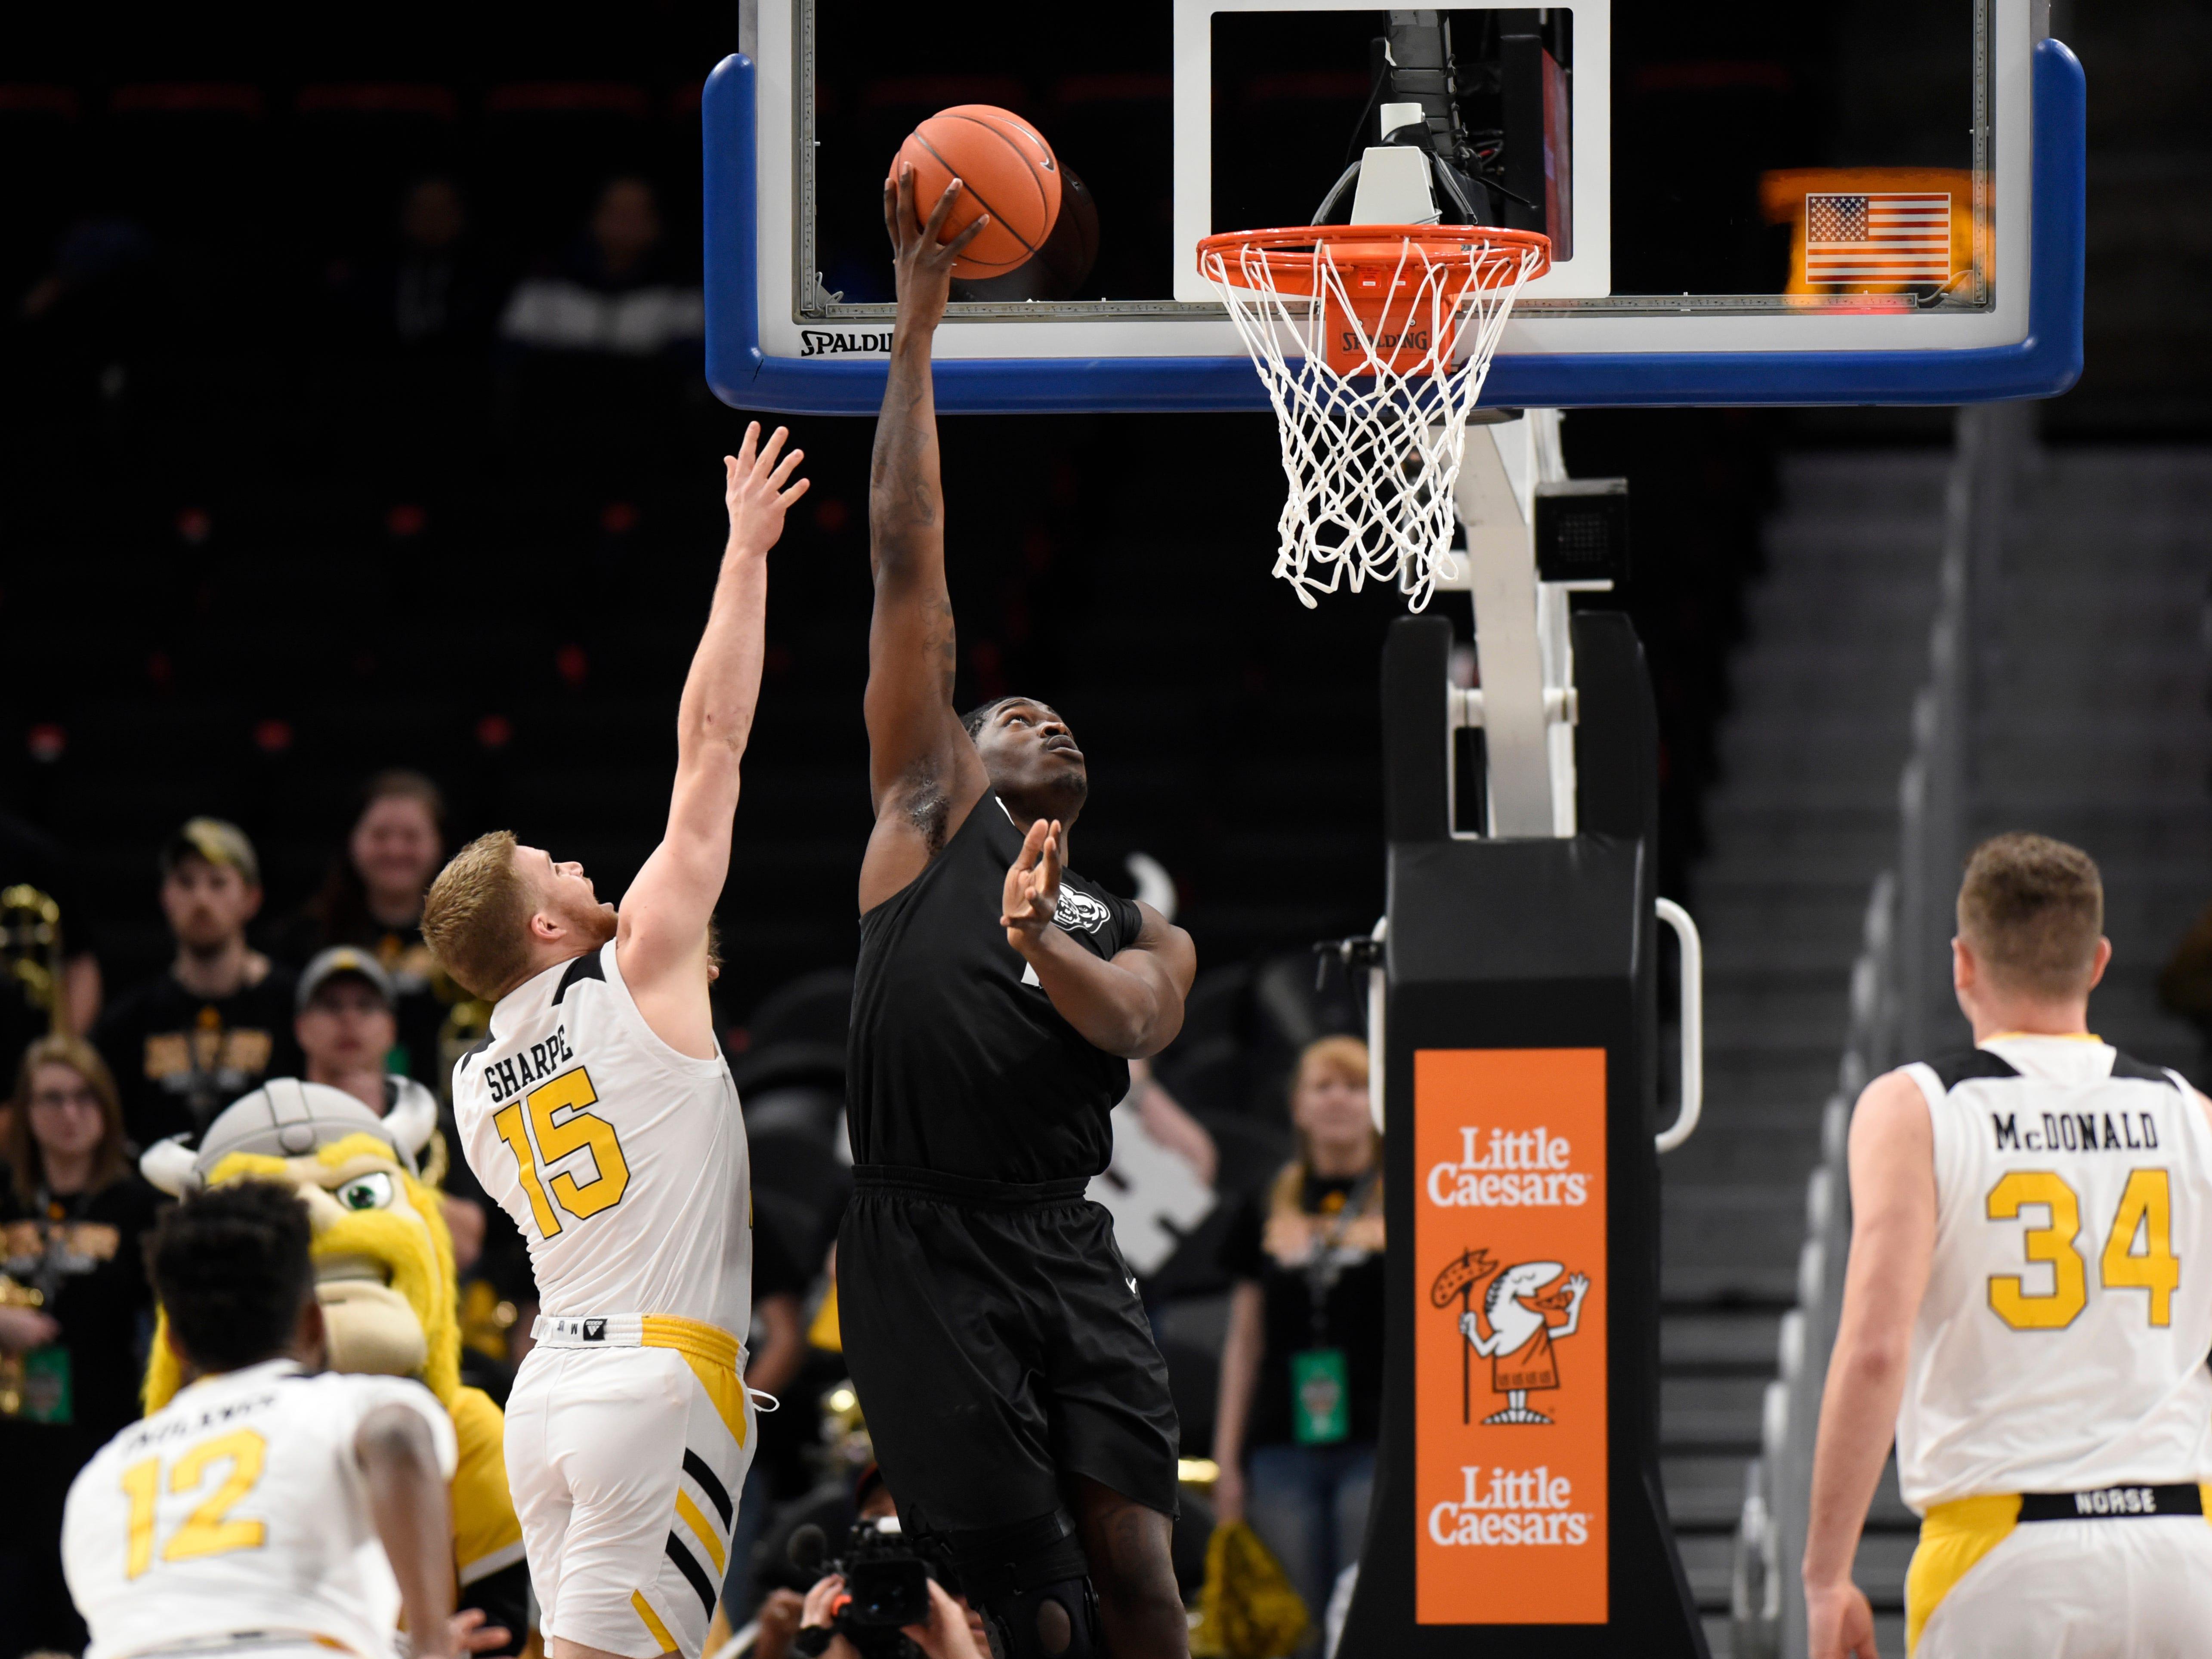 Oakland Golden Grizzlies forward Xavier Hill-Mais, right, puts up a shot over Northern Kentucky Norse guard Tyler Sharpe during the first half.